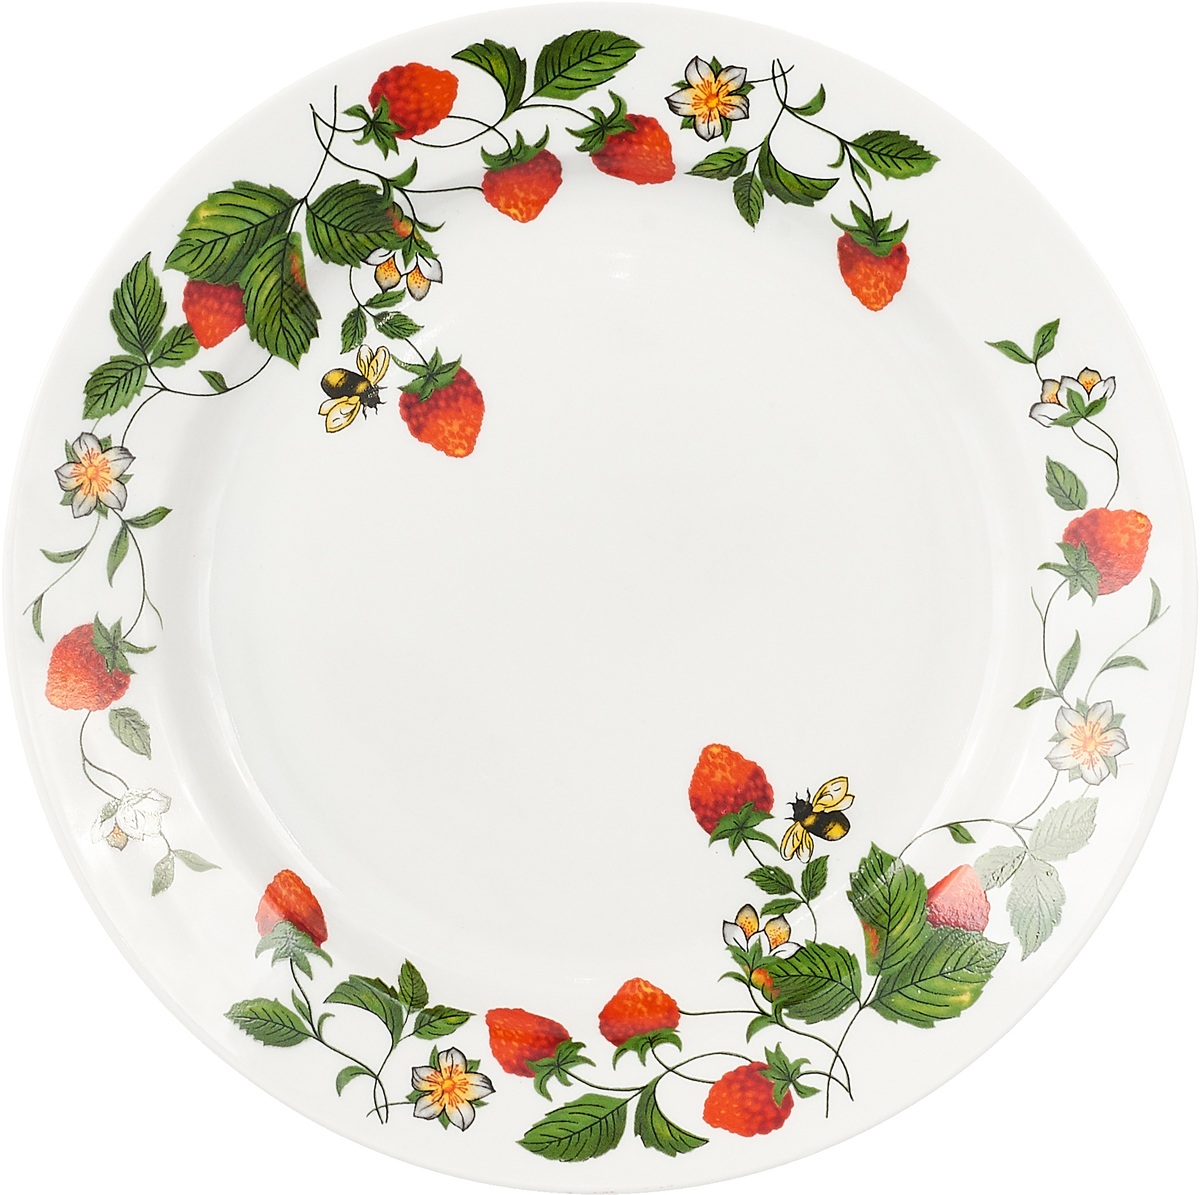 Тарелка обеденная Дулево Аромат земляники, 24 см цена